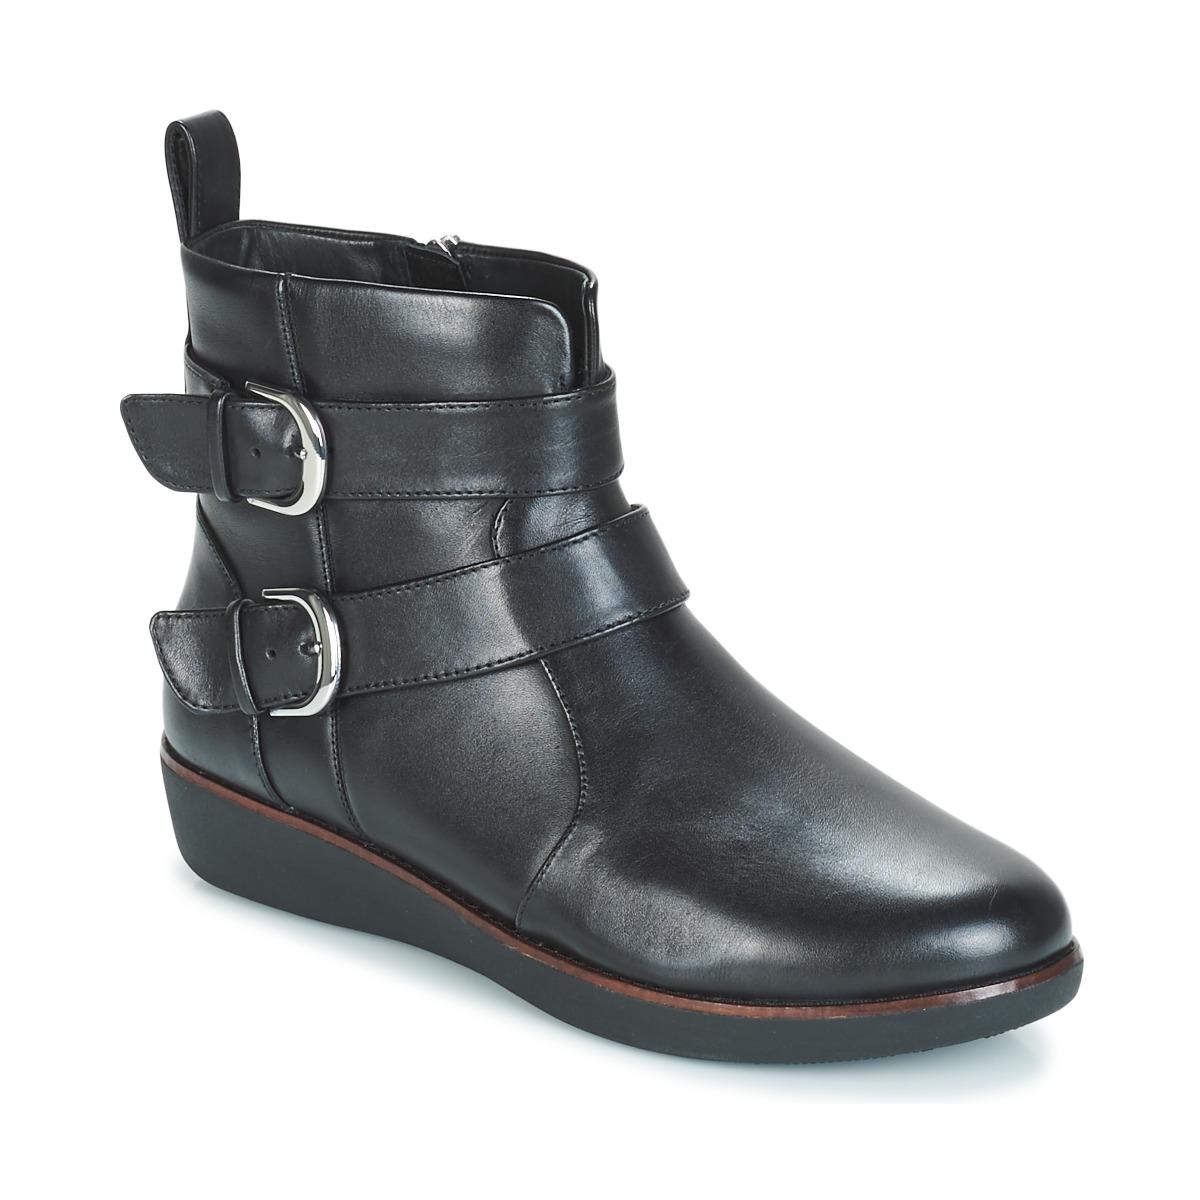 Støvler FitFlop  LAILA DOUBLE BUCKLE